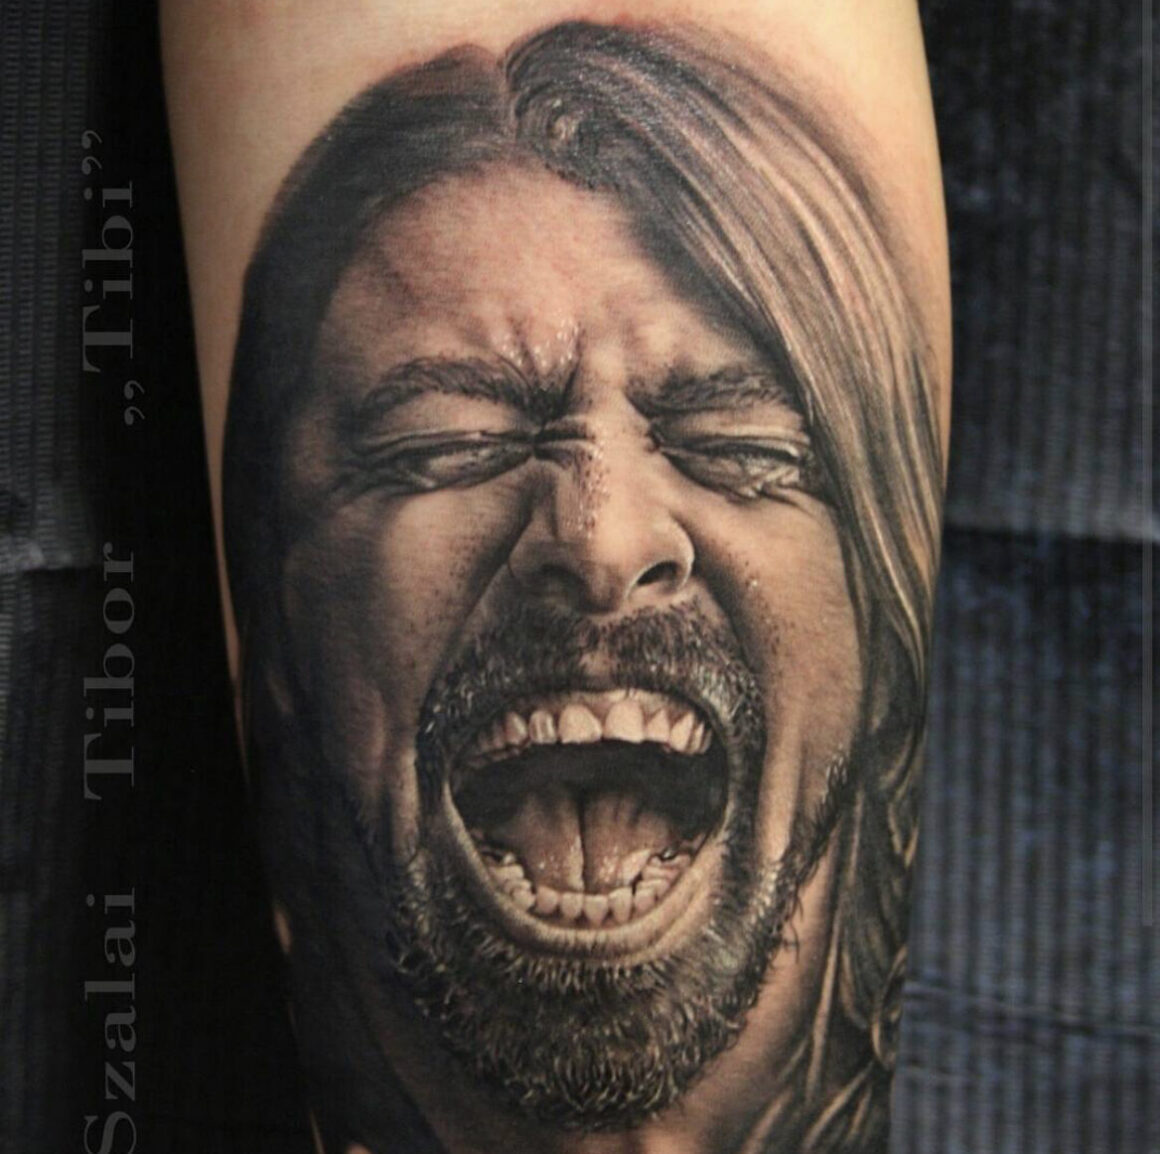 Tibor Tibi Szalai, Tempel Tattoo, Munich, Germany